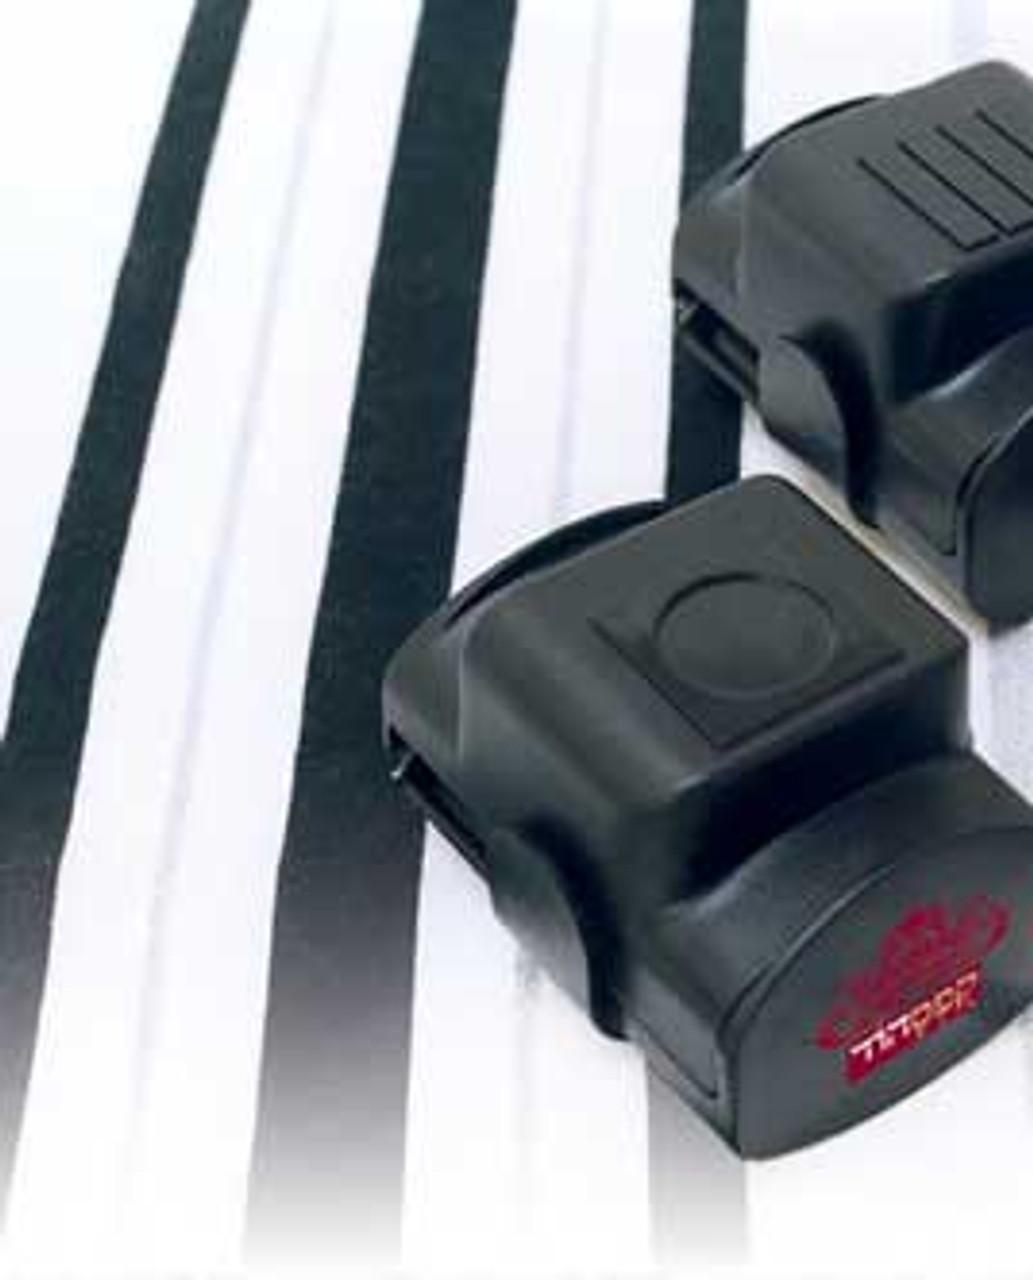 Kufsa Hod Advanced Tefillin Cases